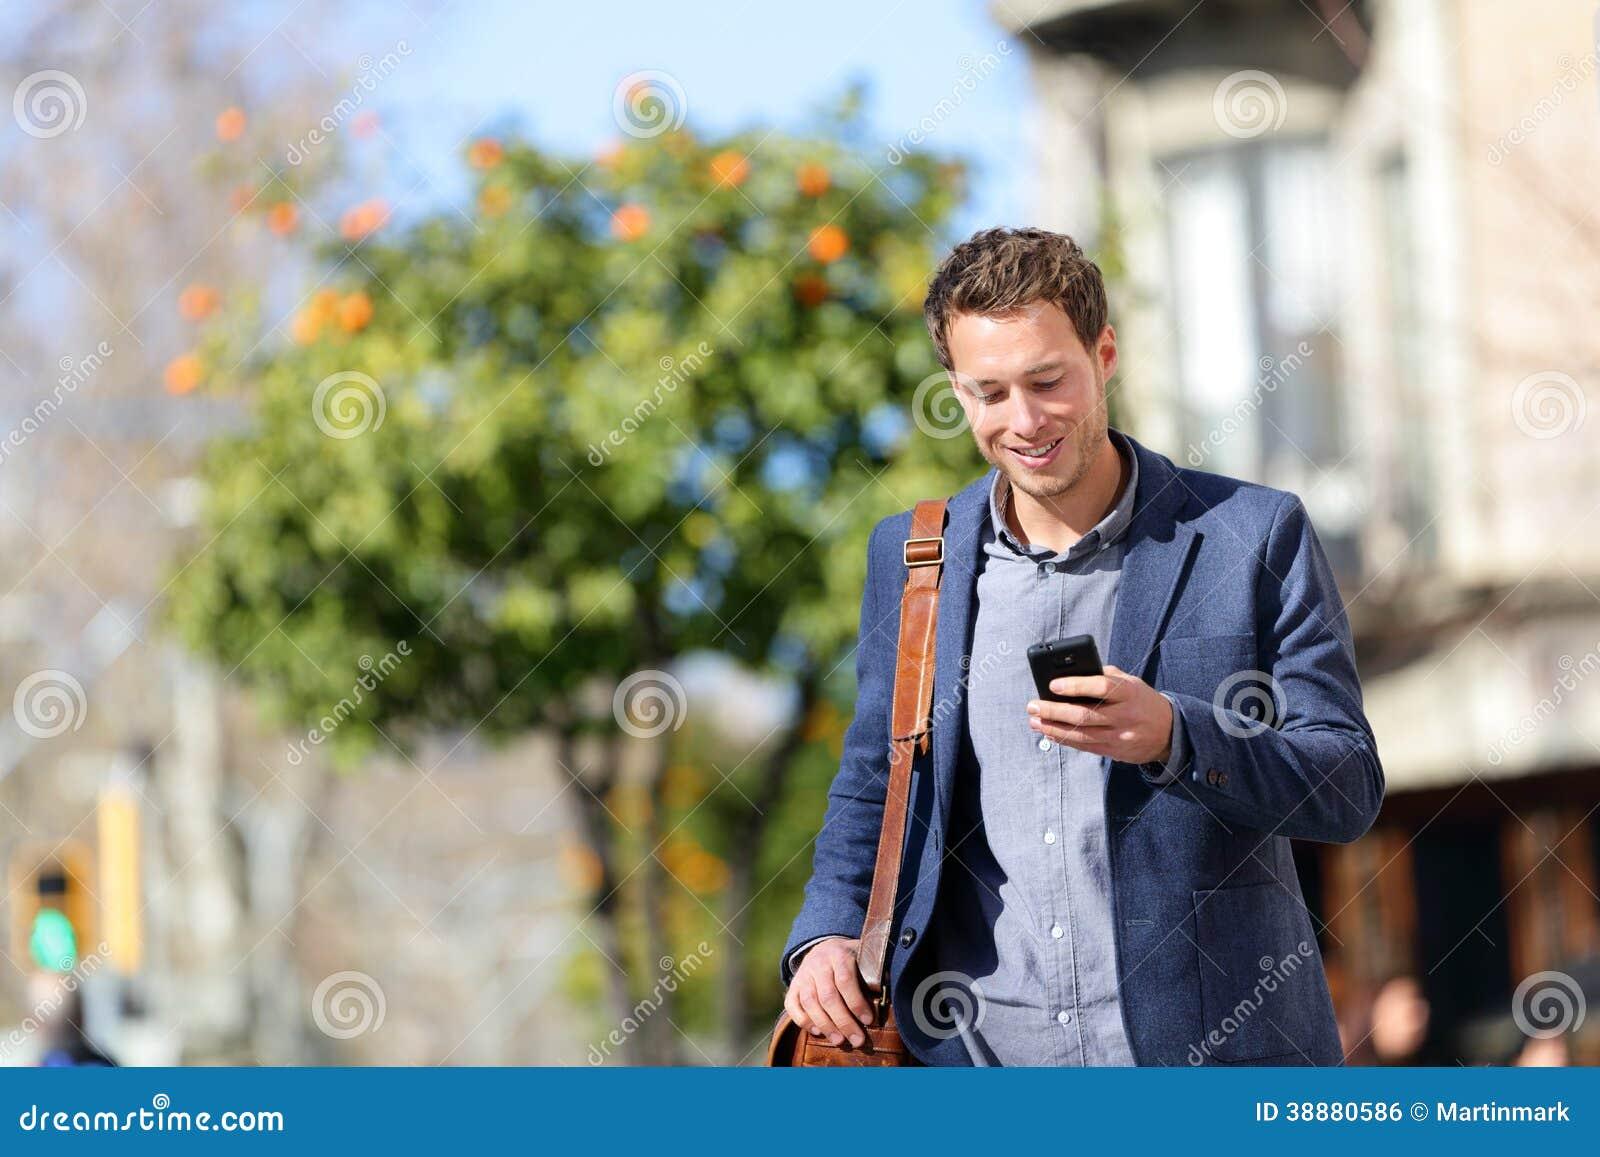 Jonge stedelijke professionele mens die slimme telefoon met behulp van